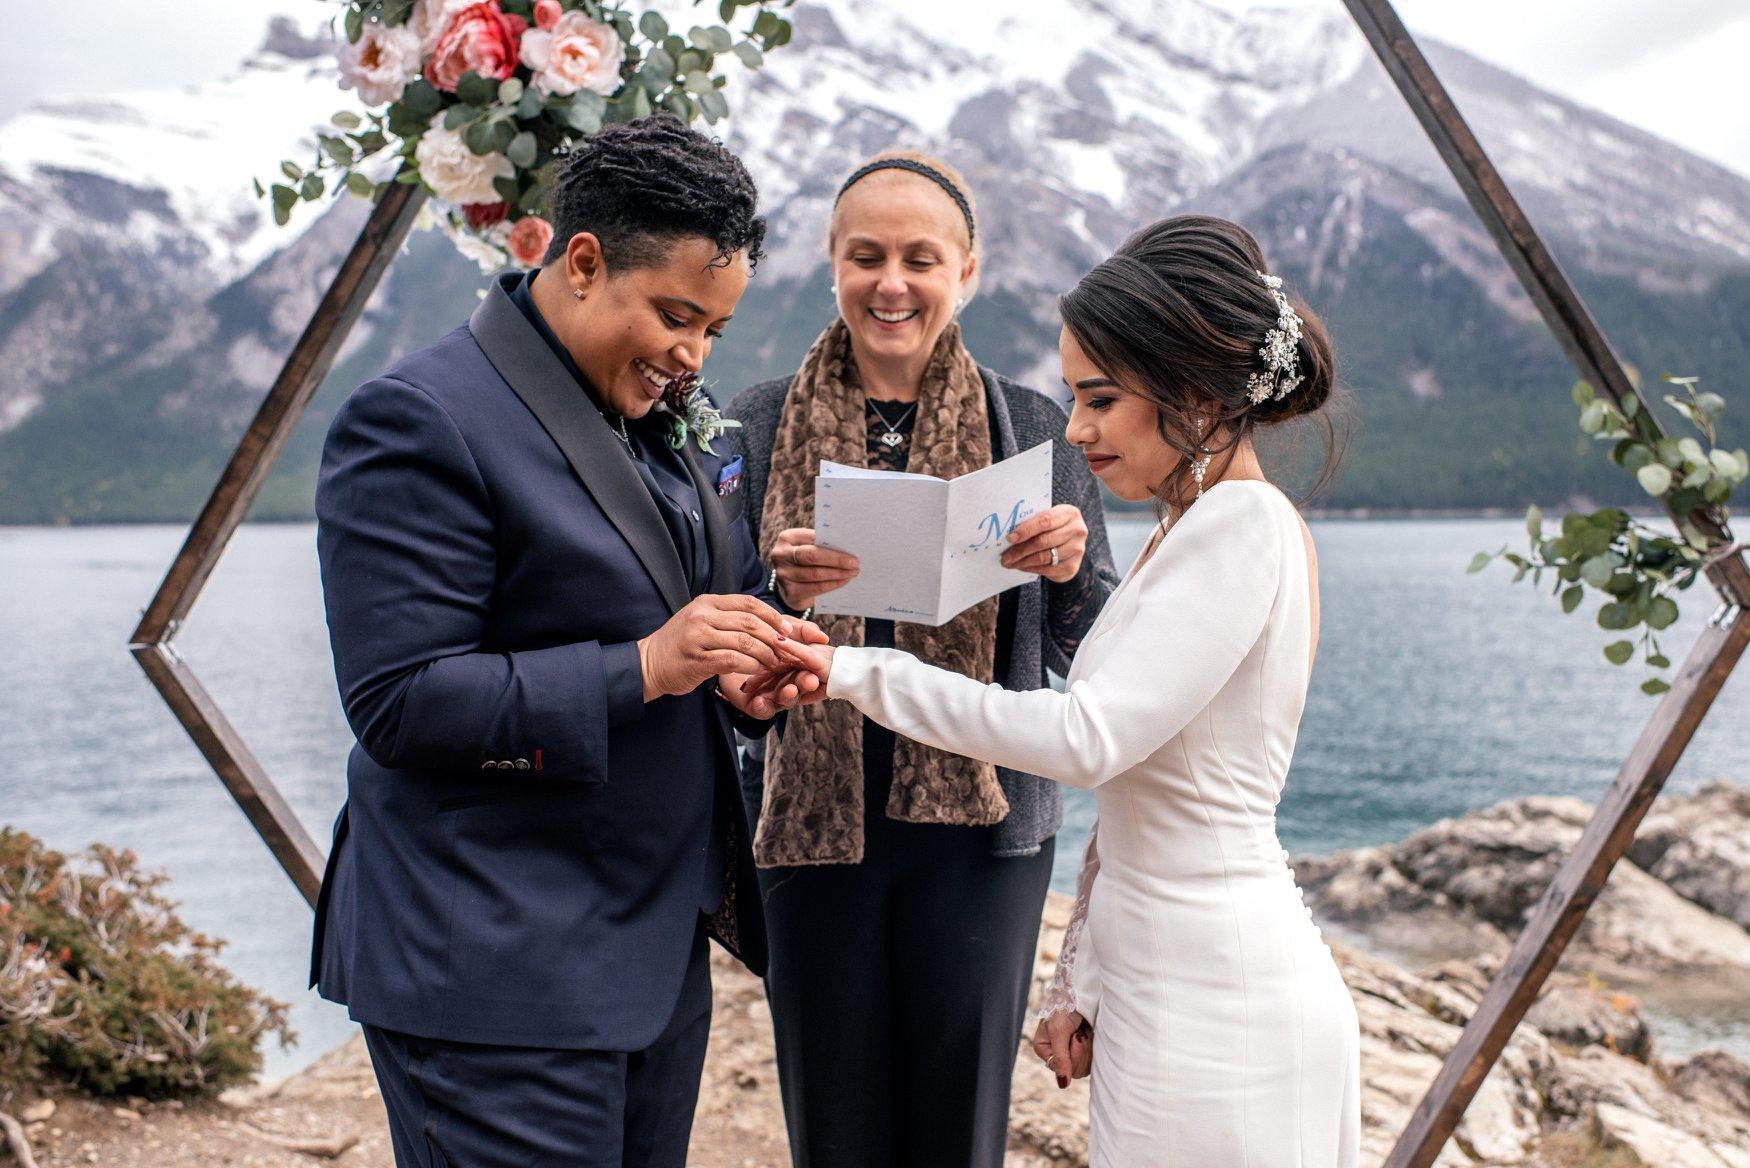 Wedding Ceremony Inspiration in Banff, CA